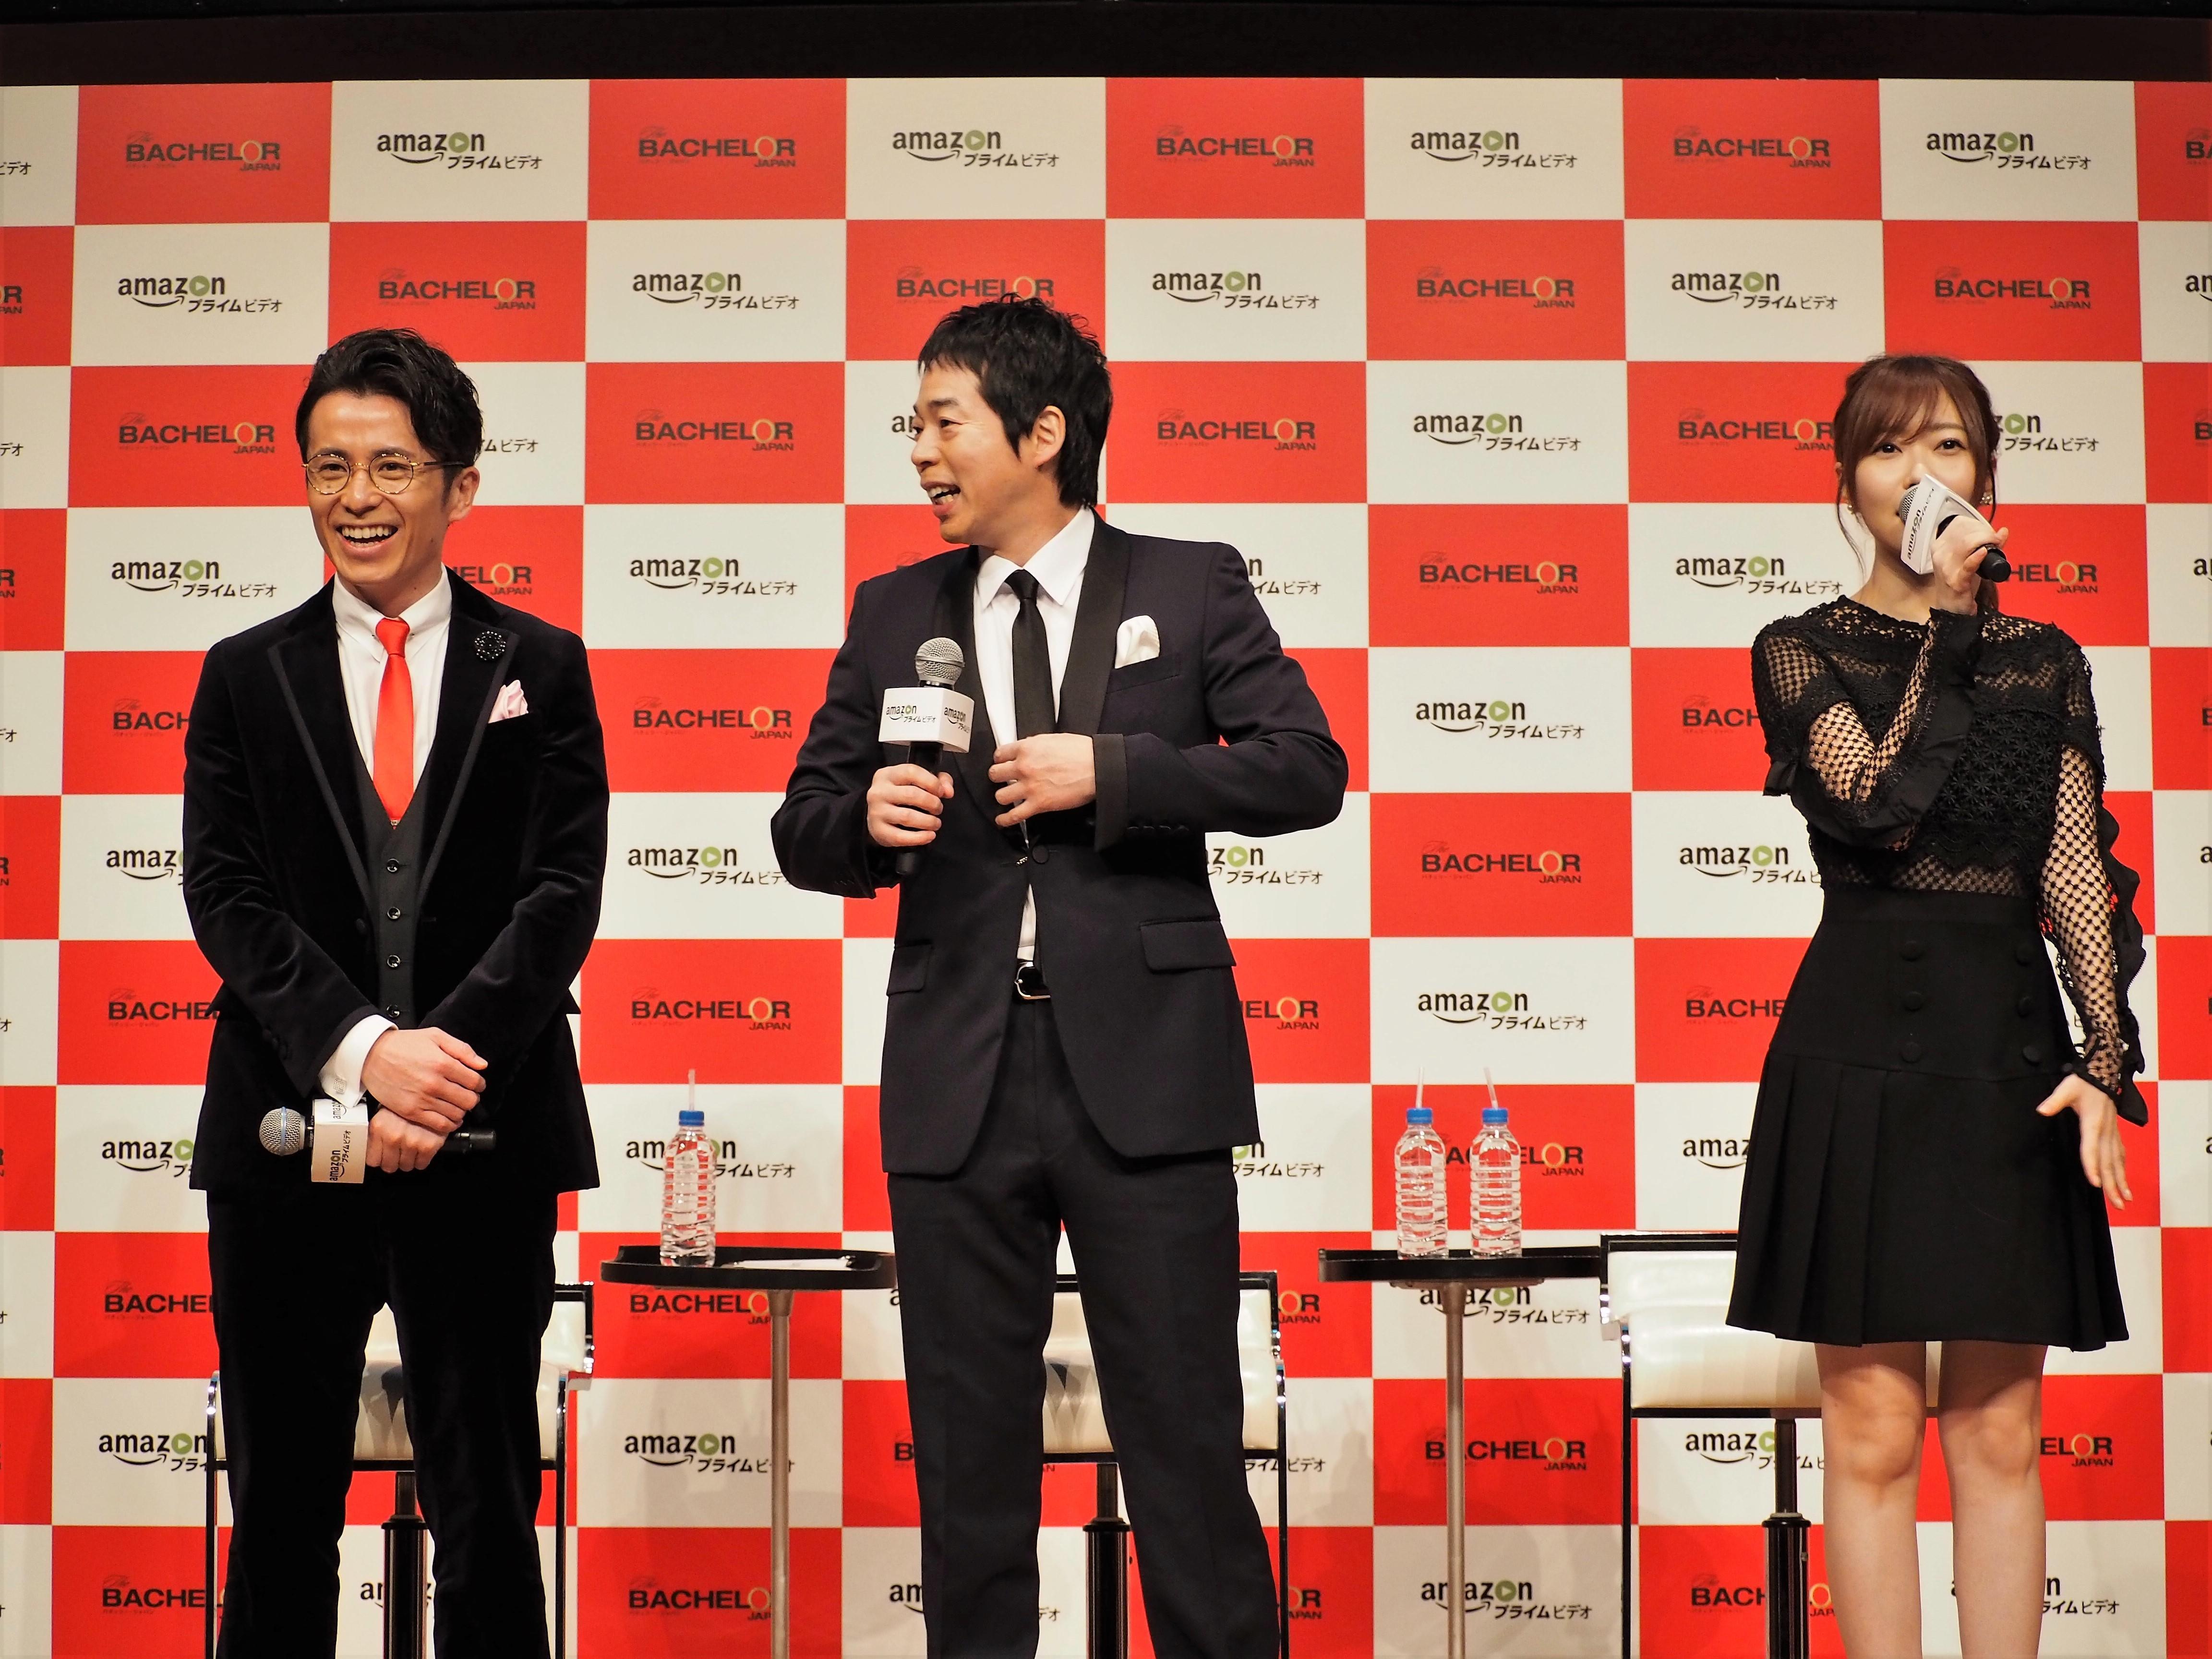 http://news.yoshimoto.co.jp/20171204164740-7d73abdb36540114495d8faeb5418cd1522d58ea.jpg